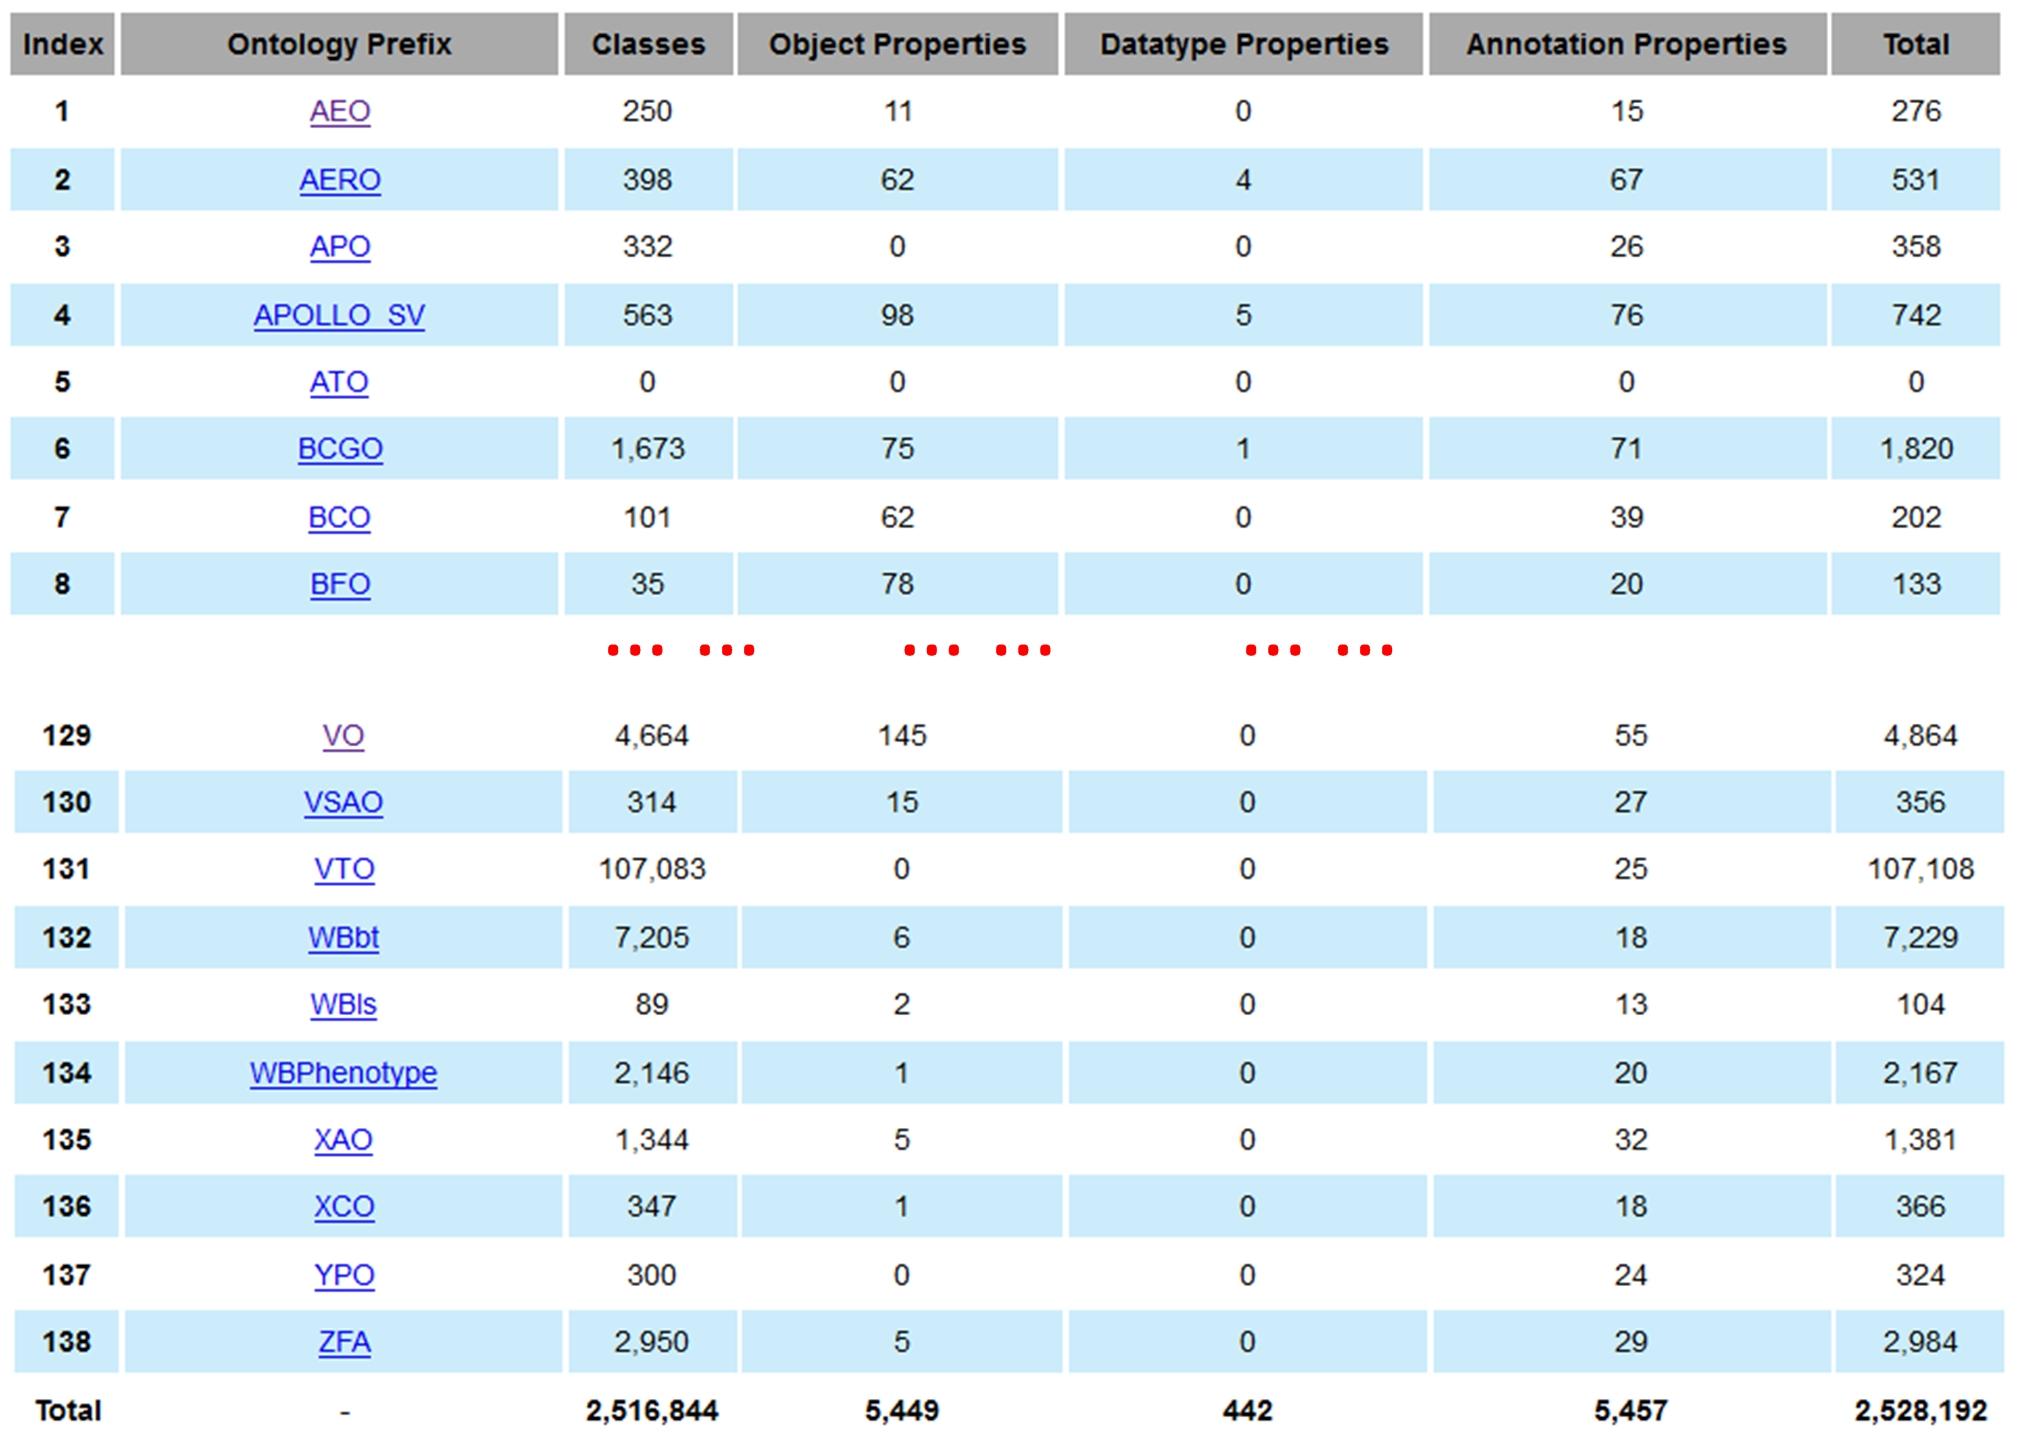 Statistics of all ontologies